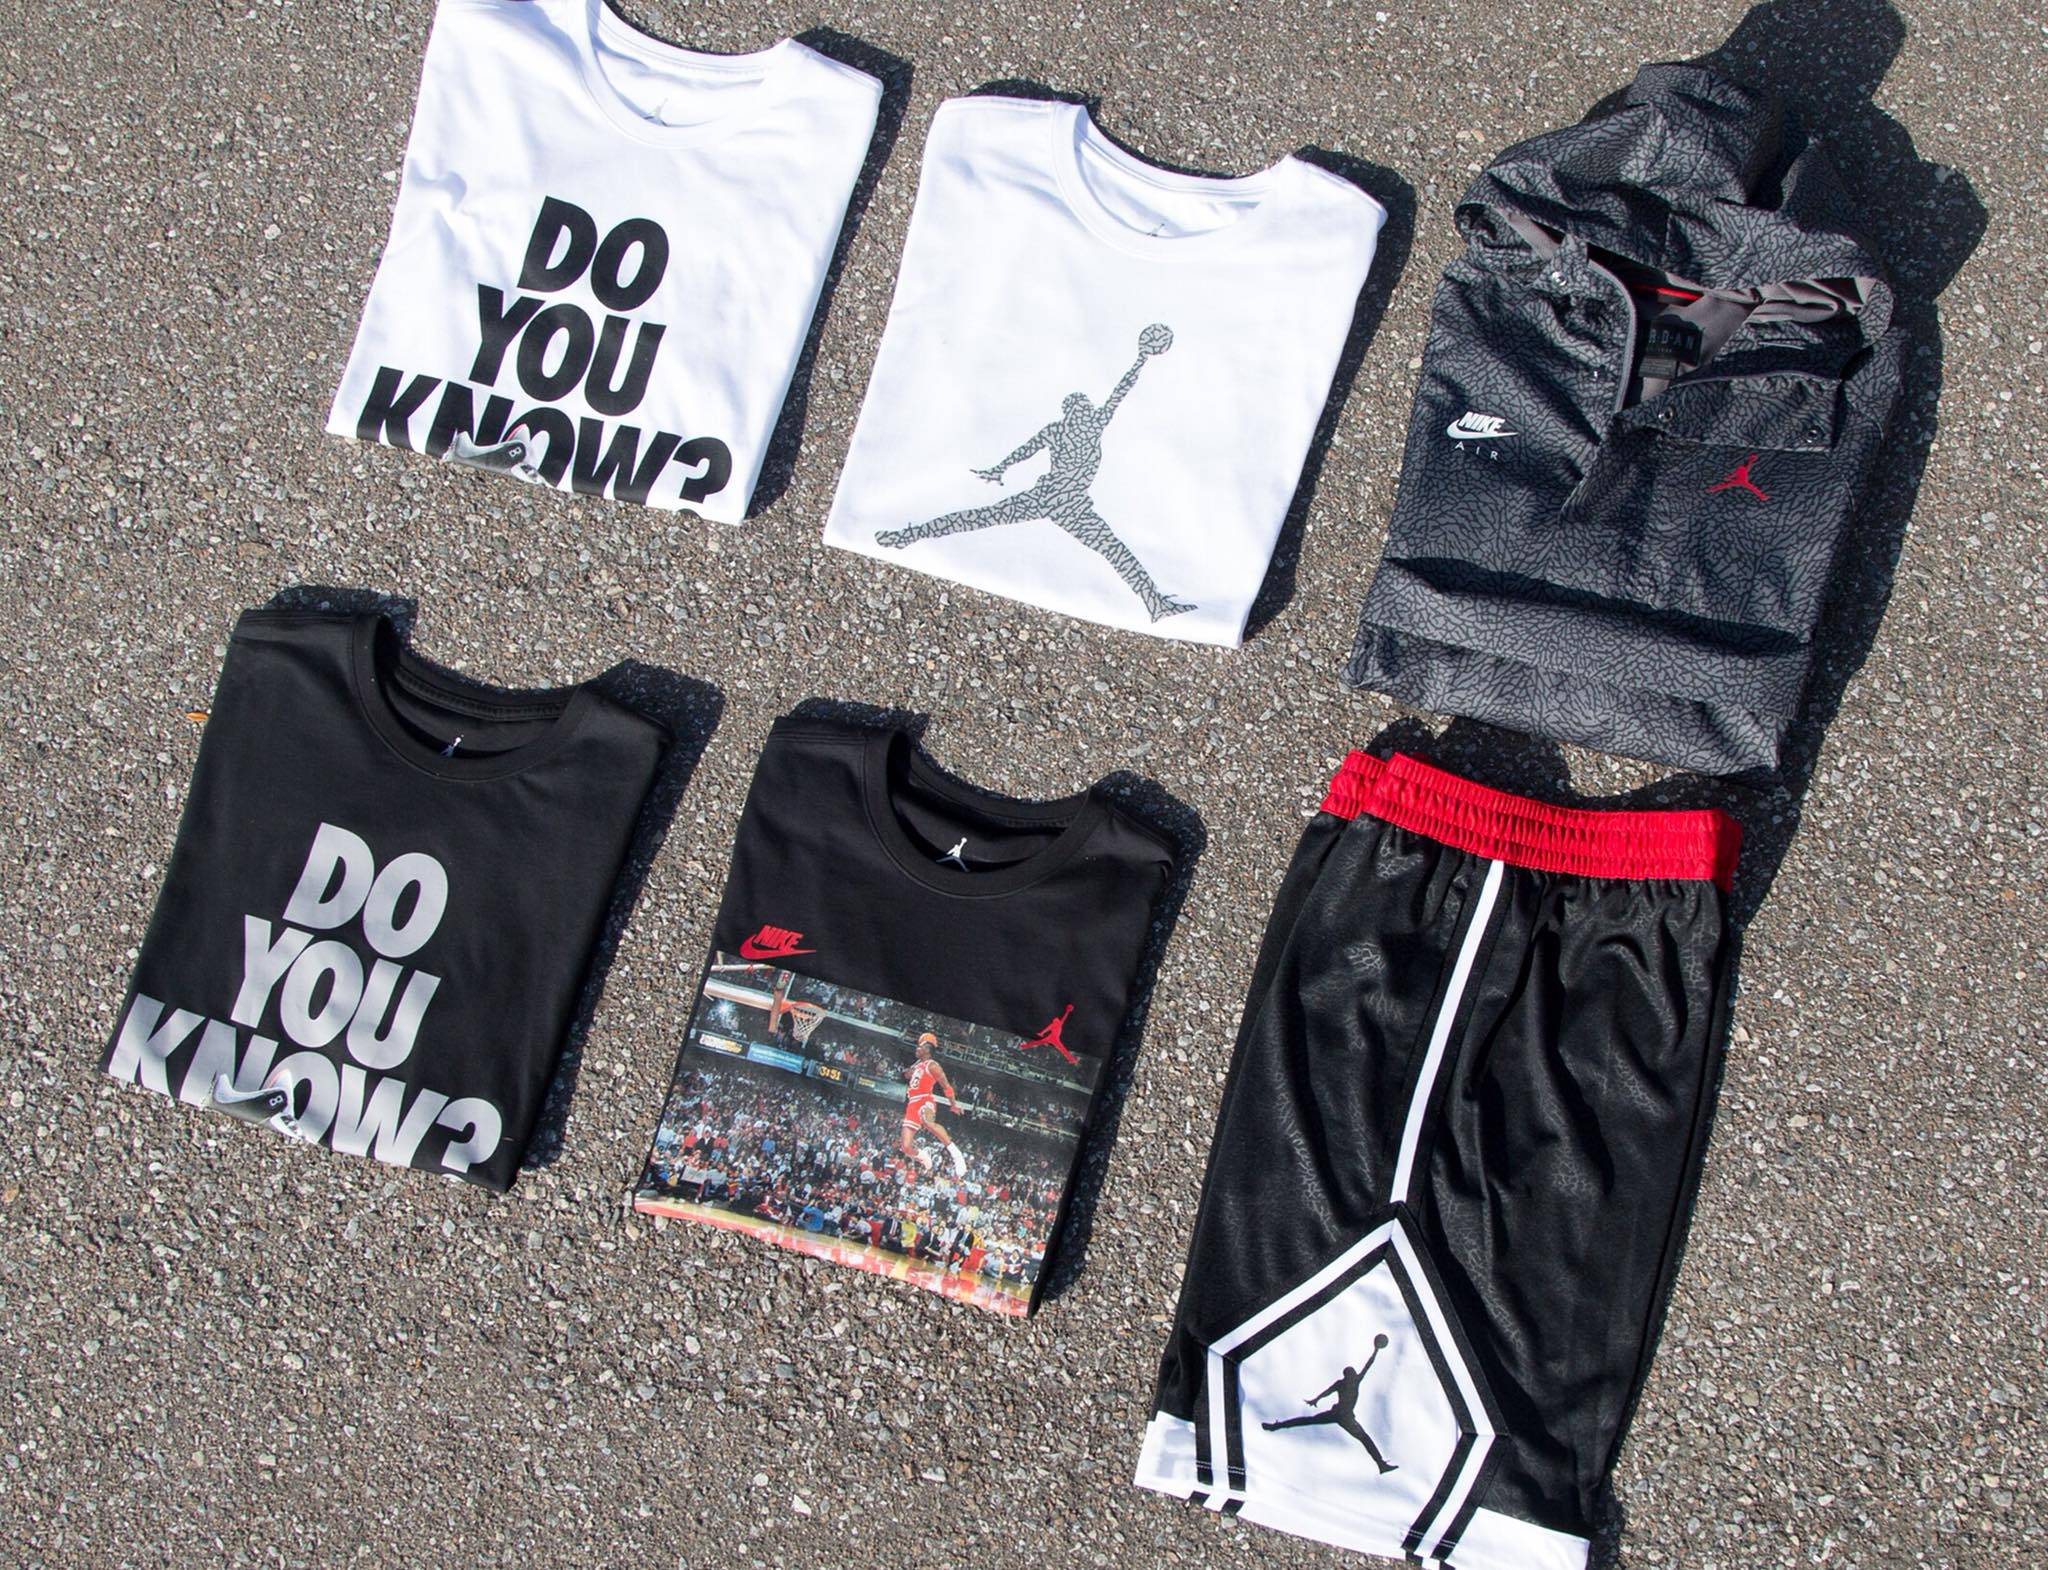 jordan-3-black-cement-apparel